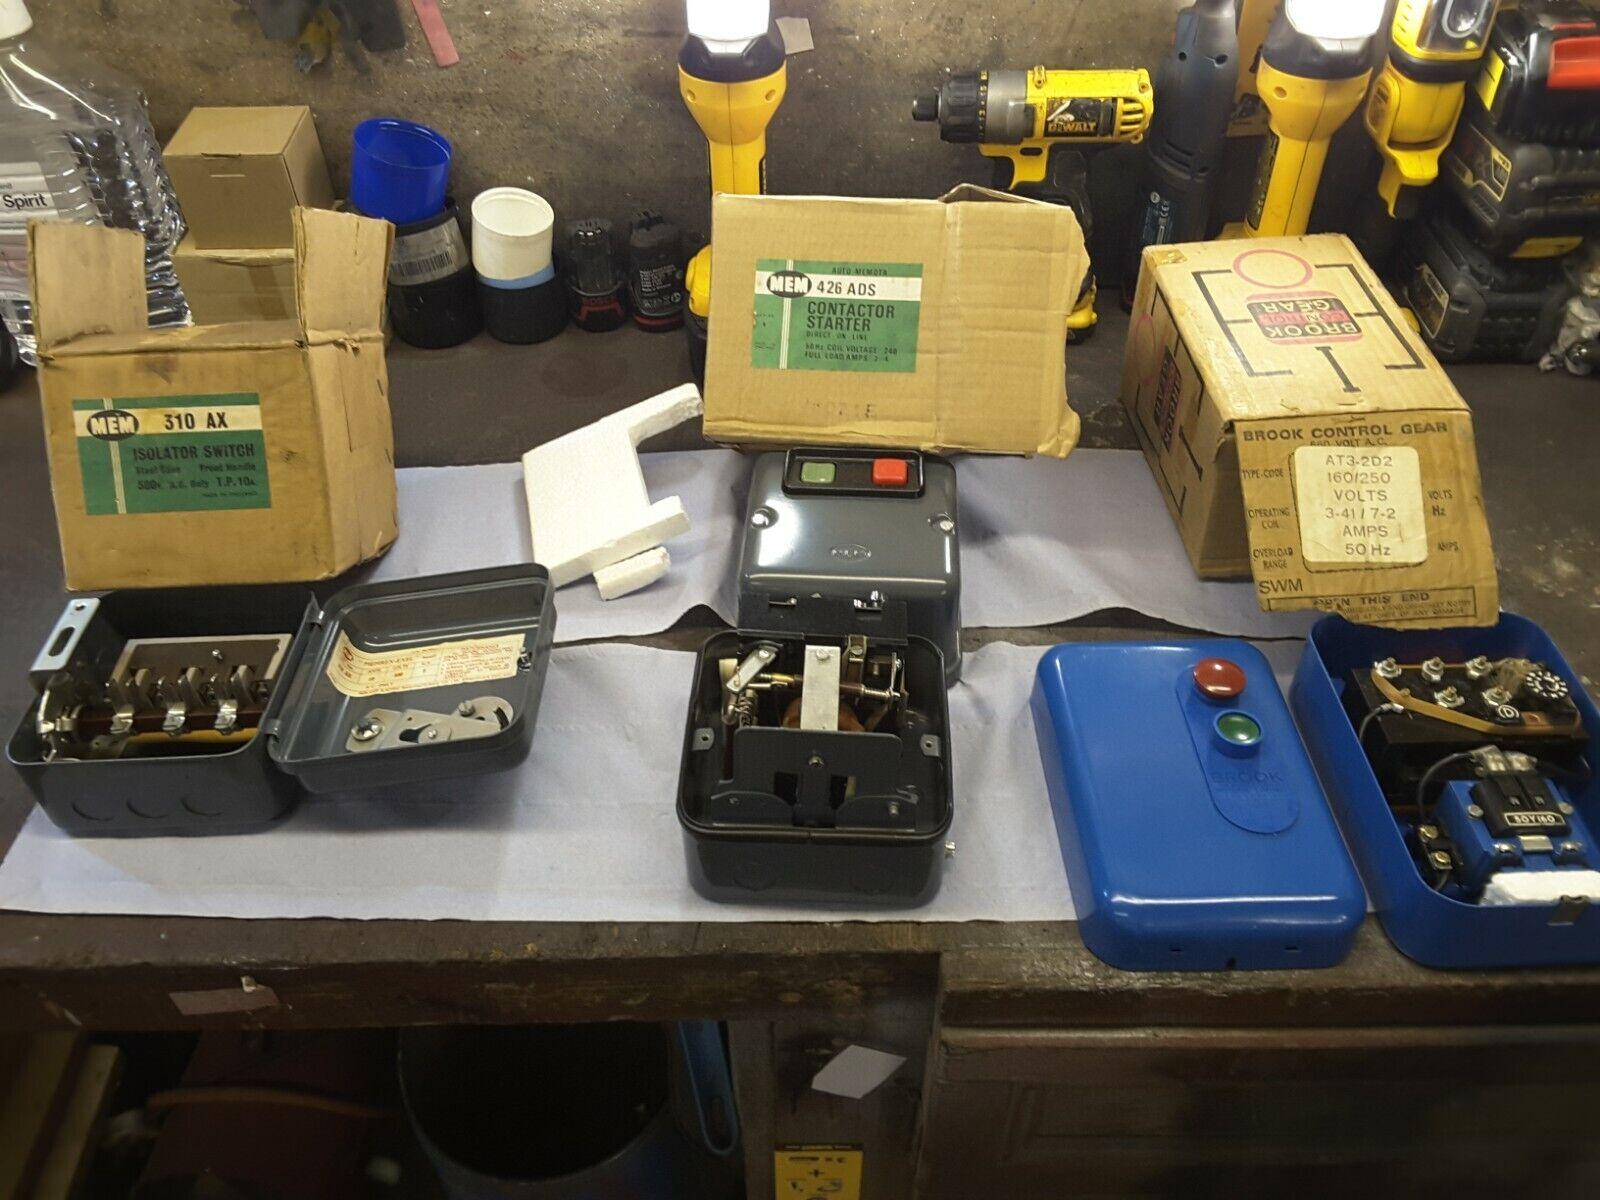 MEM 310 AX ISOLATOR SWITCH/MEM 426 ADS CONTACTOR STARTER/BROOK CONTROL GEAR